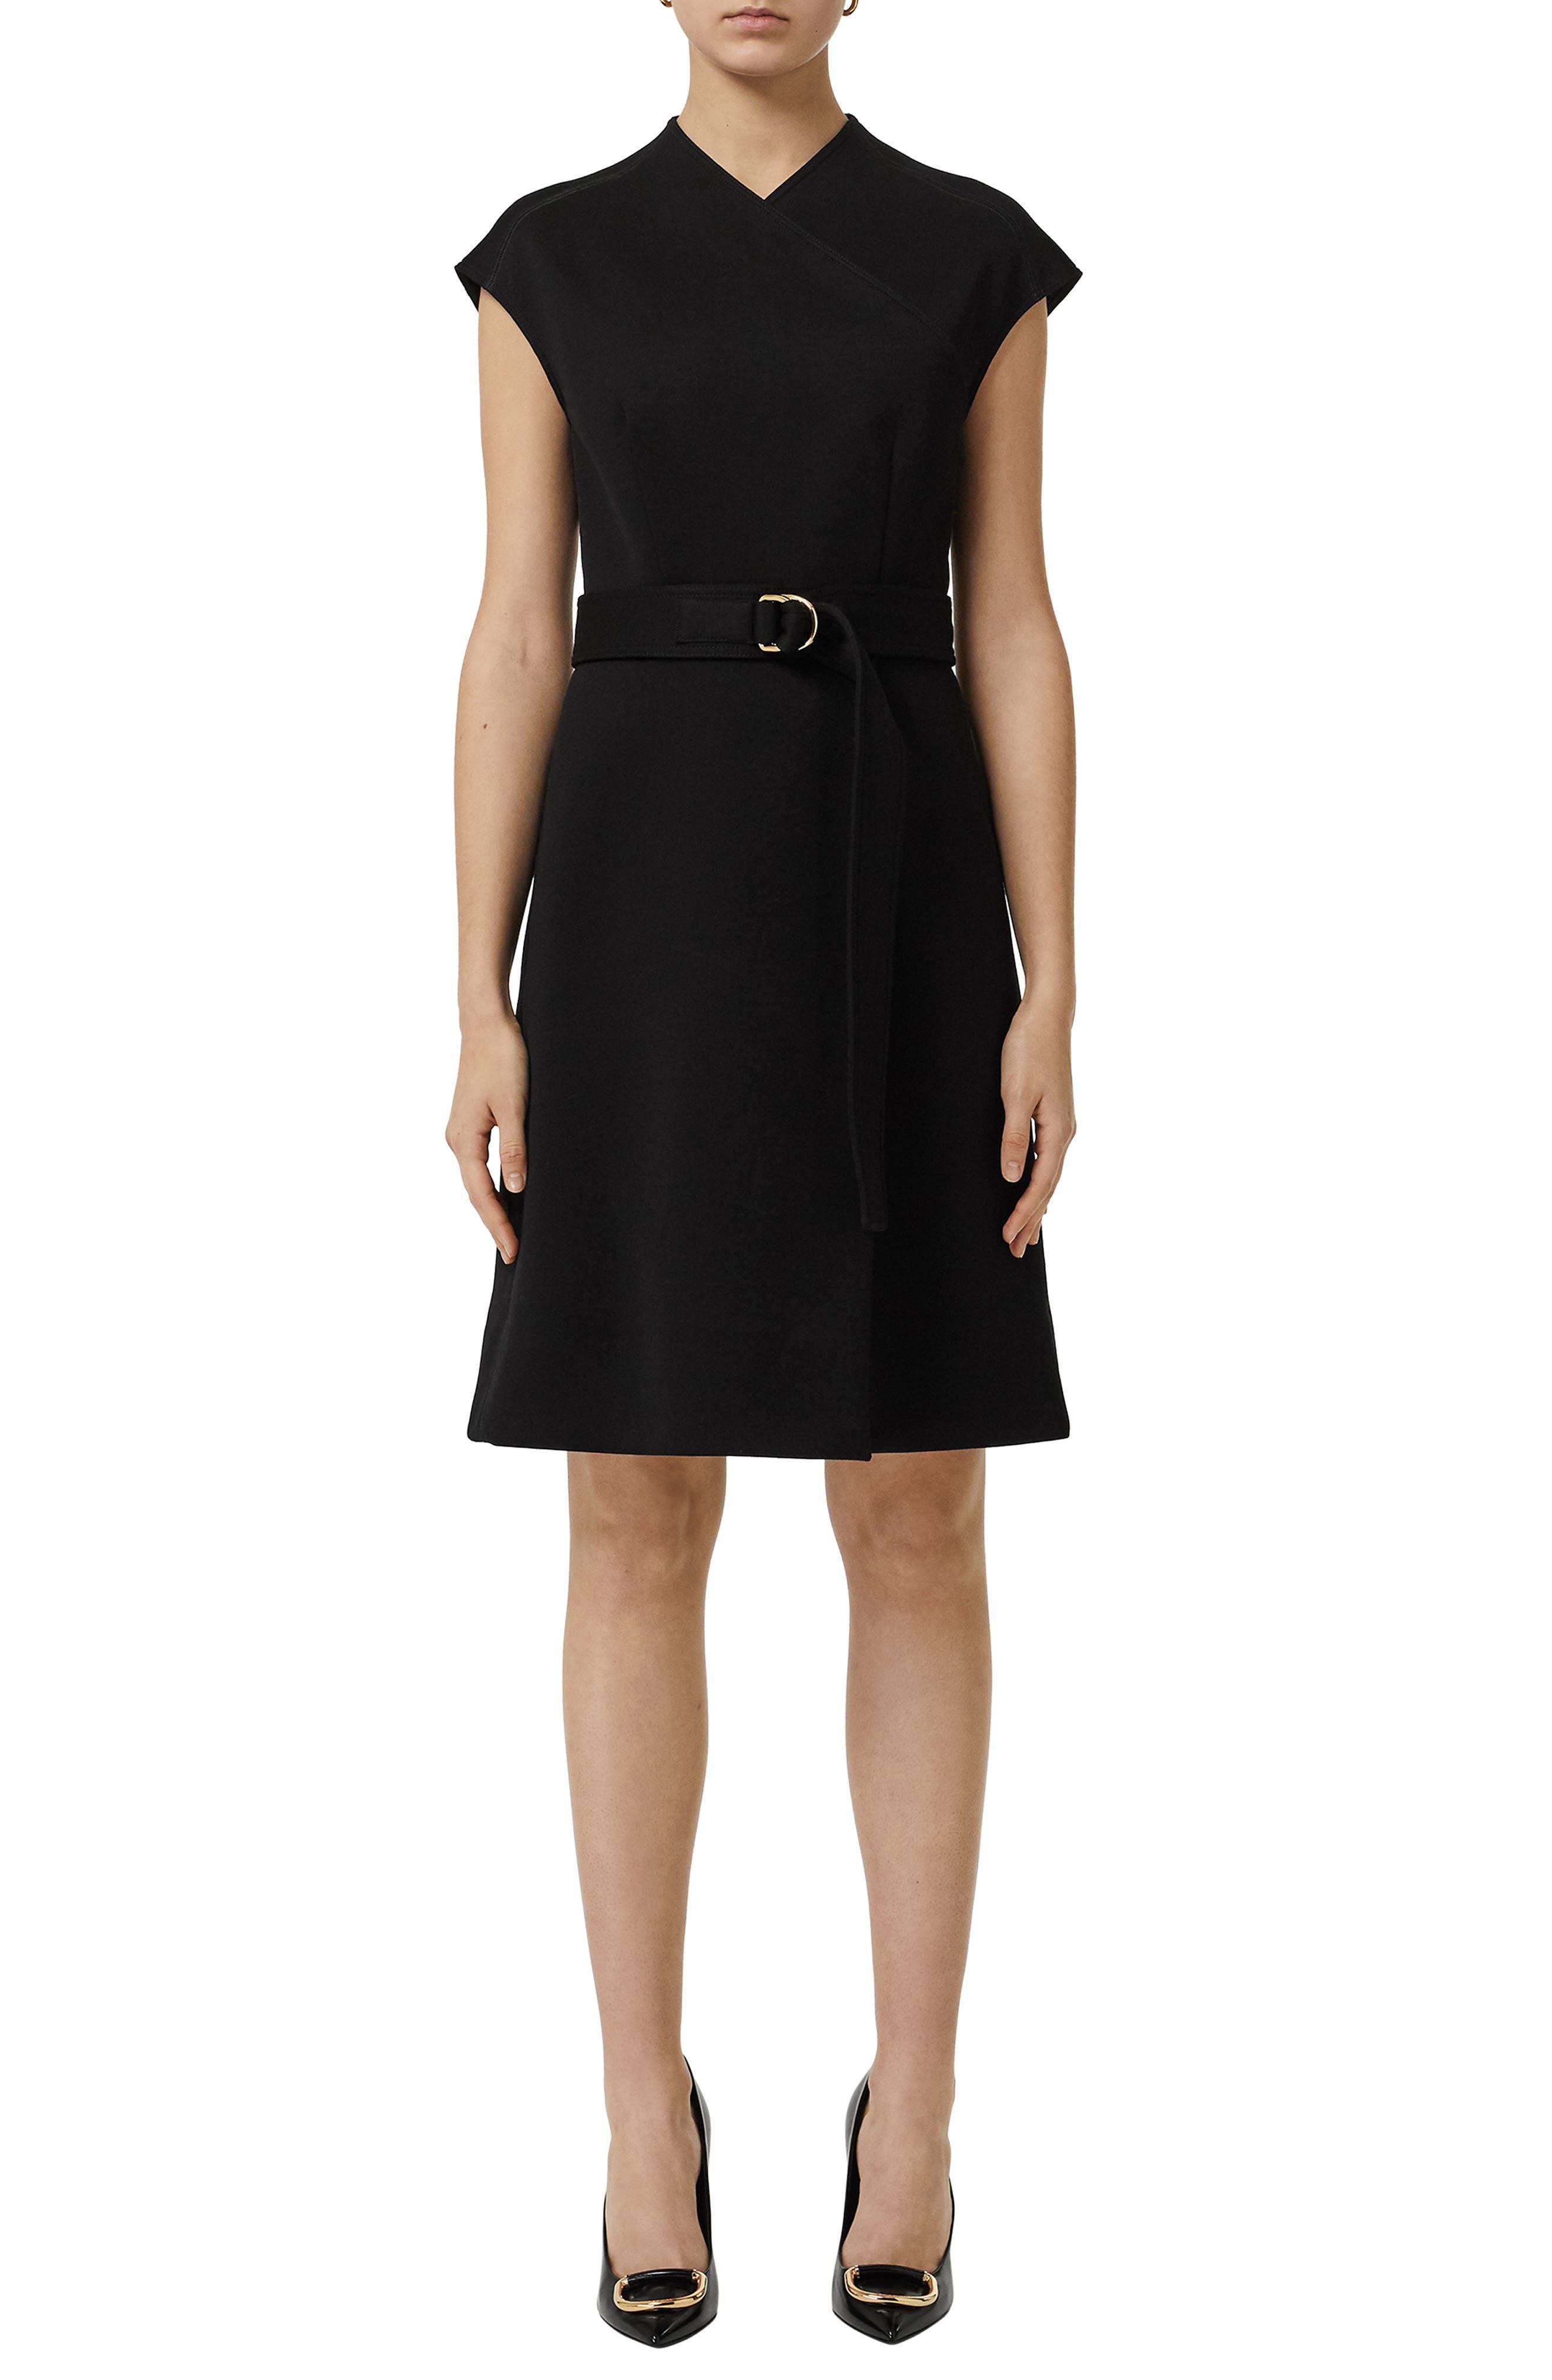 Dulsie D-Ring Detail Bonded Jersey Dress,                         Main,                         color, BLACK